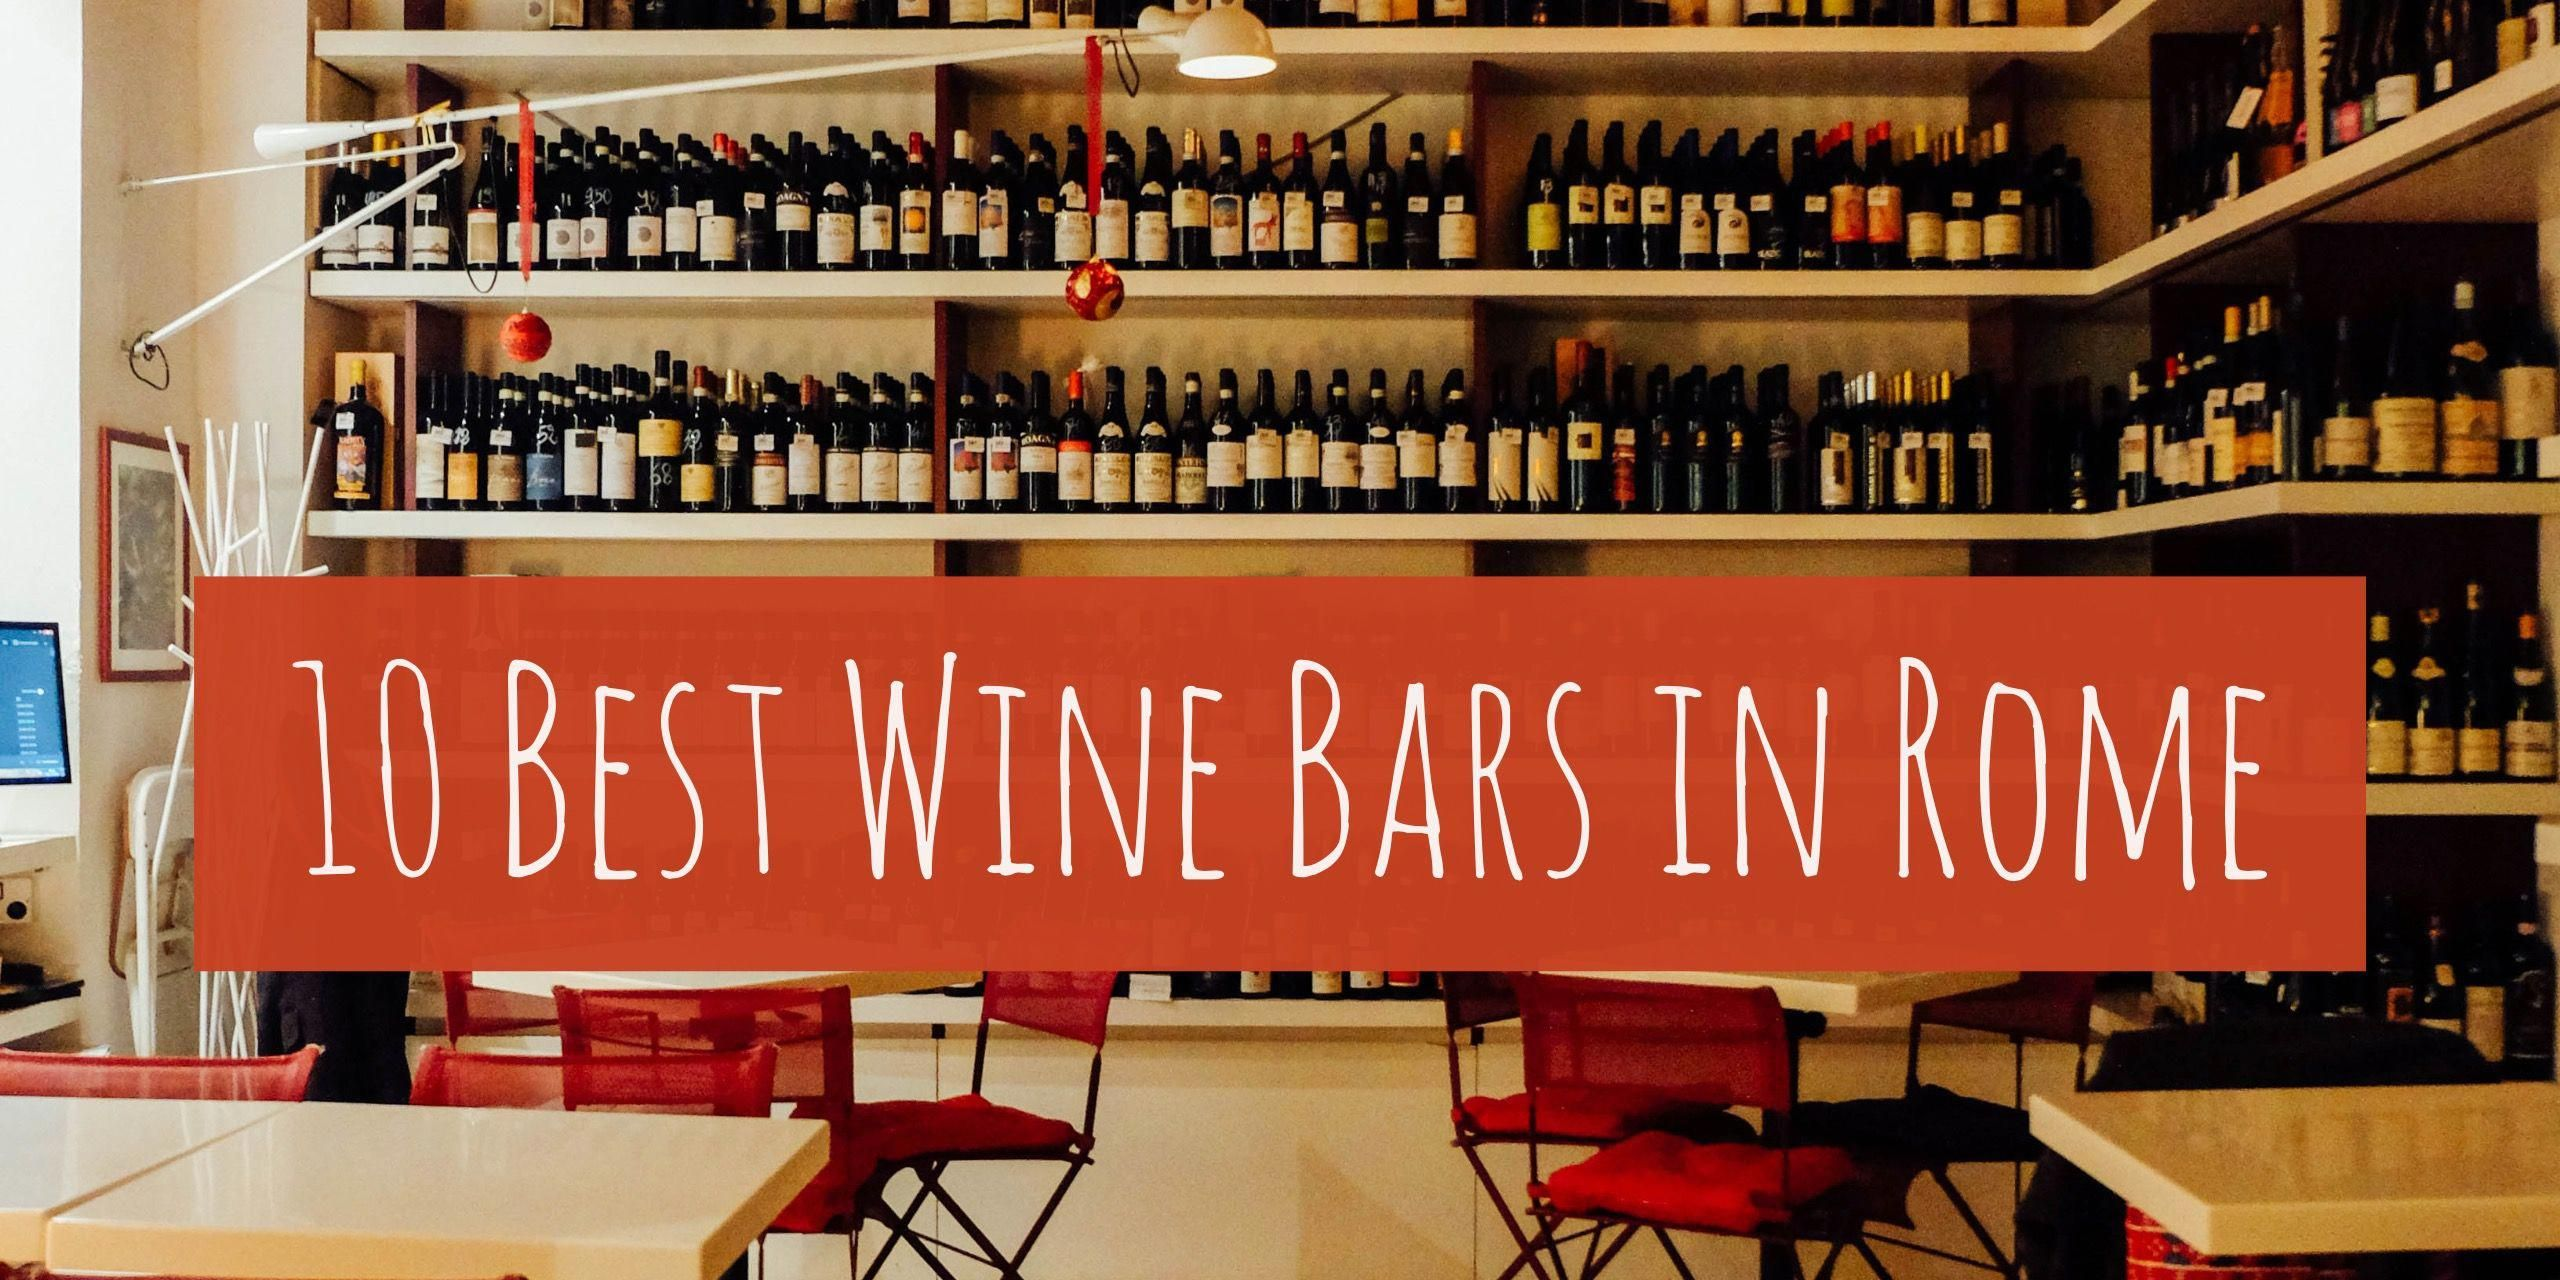 Expensive Wine Opener Winestorage Barolowine Rome Barolo Wine Wine Food Festival